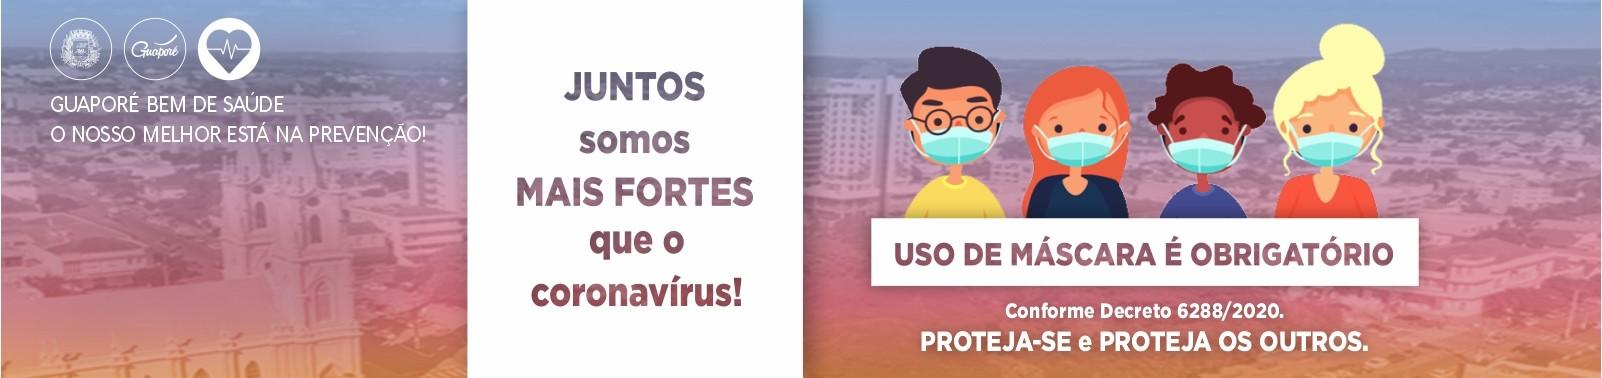 Banner 3 - Uso de Máscaras - OBRIGATÓRIO